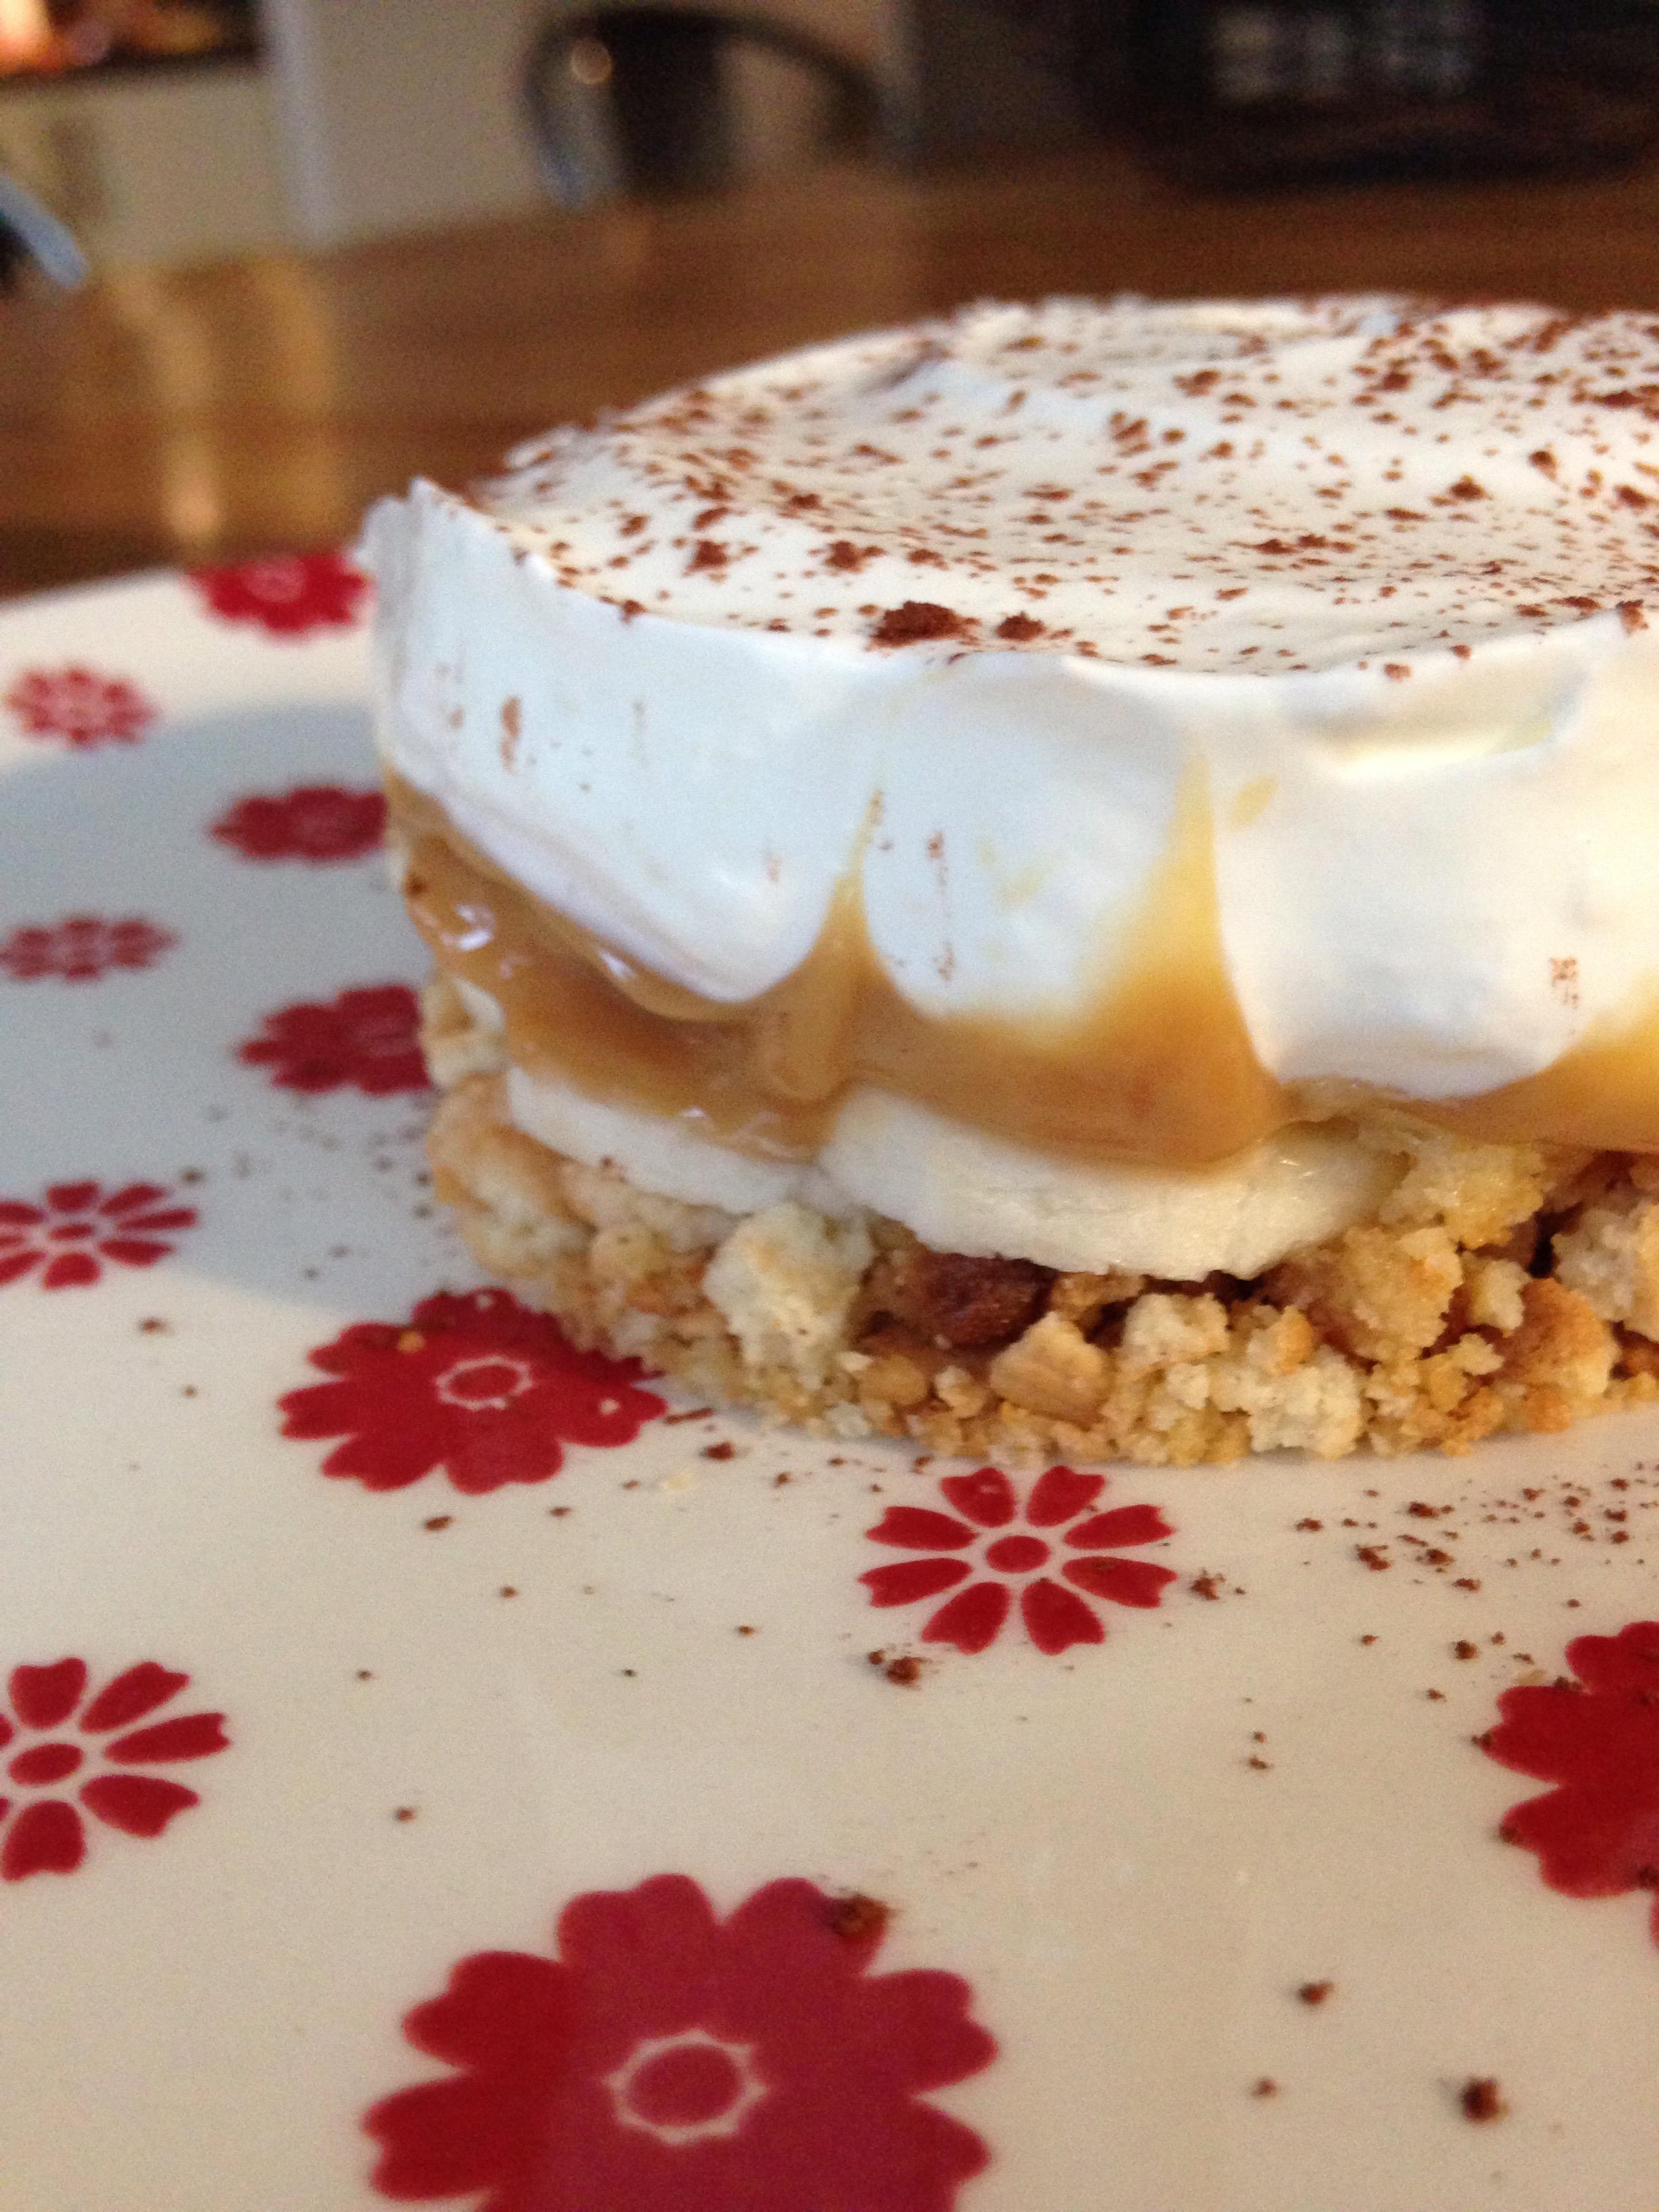 Recette de dessert Banofi